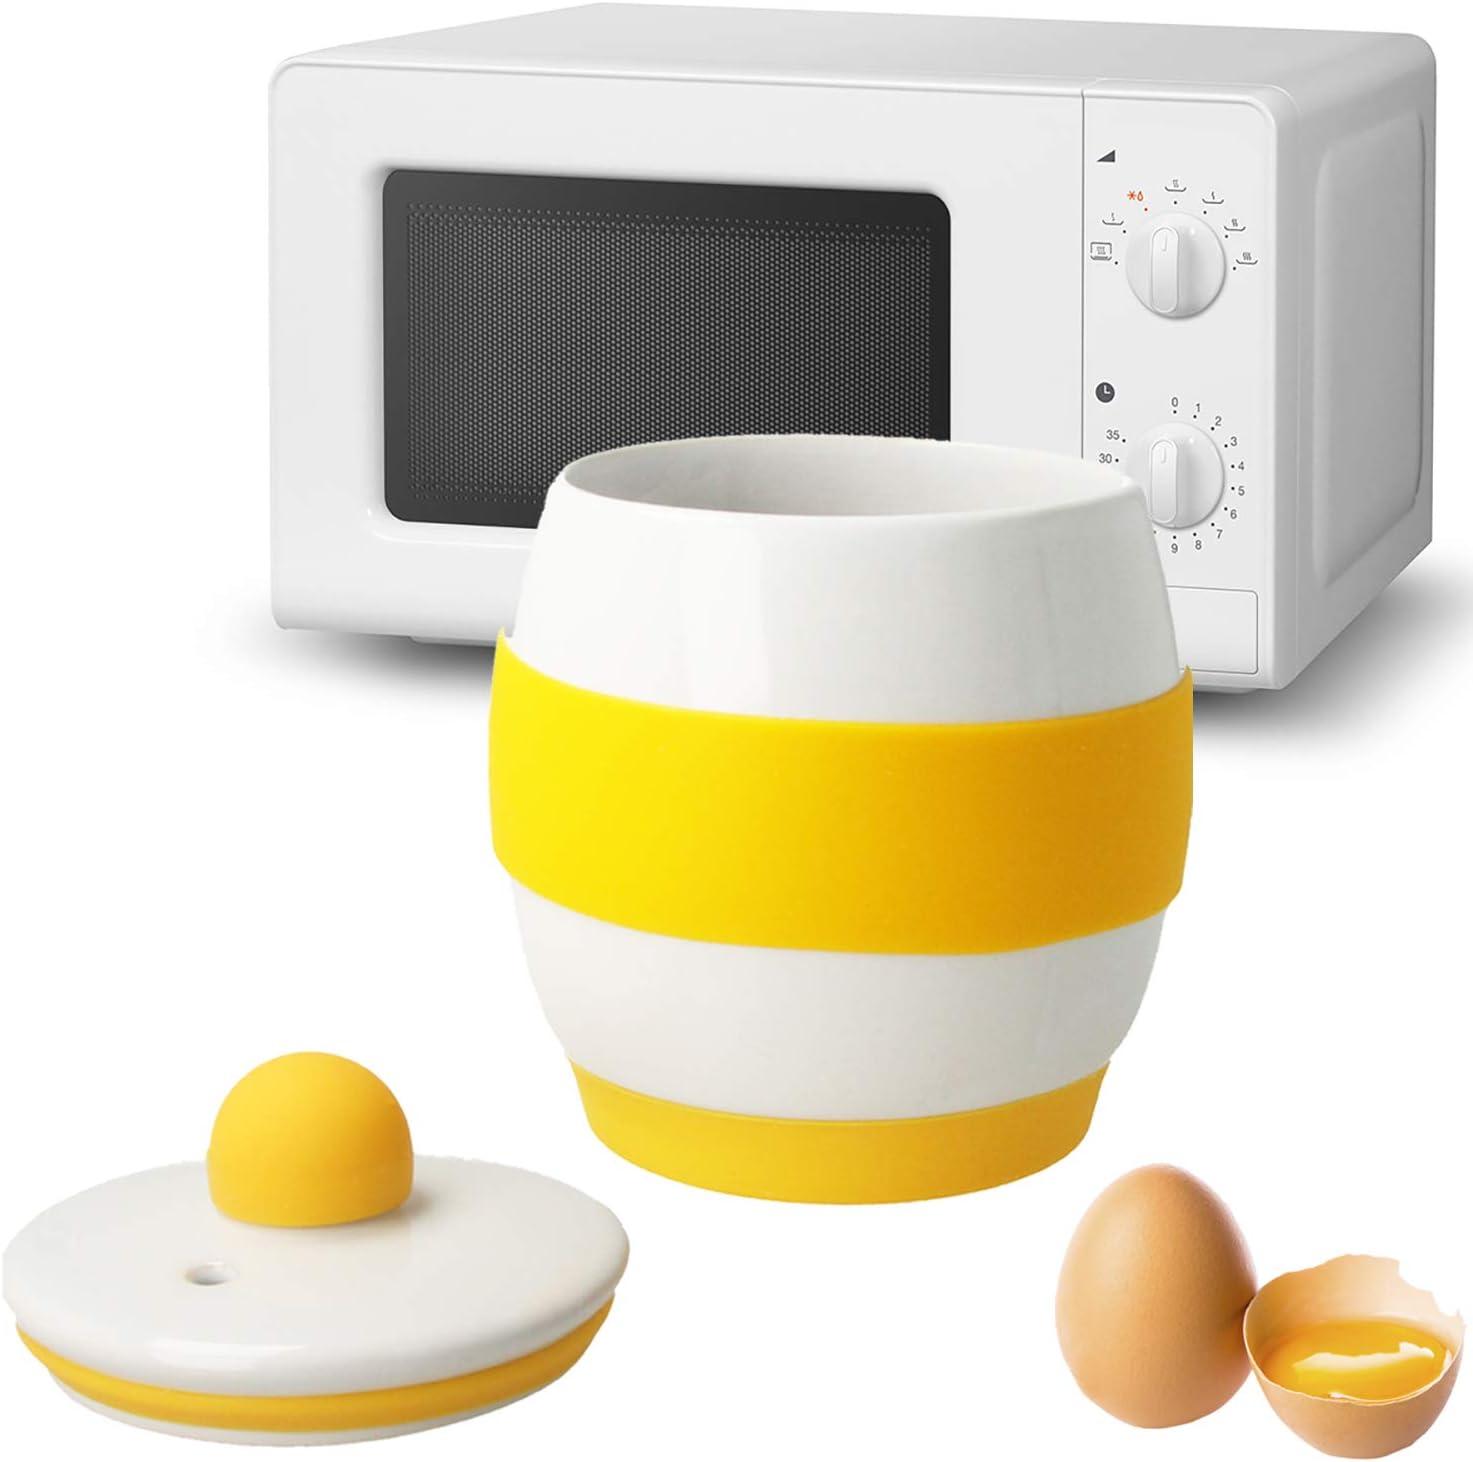 Wei/ß MovilCom/® Mikrowellen-Ei Egg Poacher Mikrowellen-Eier aus Keramik